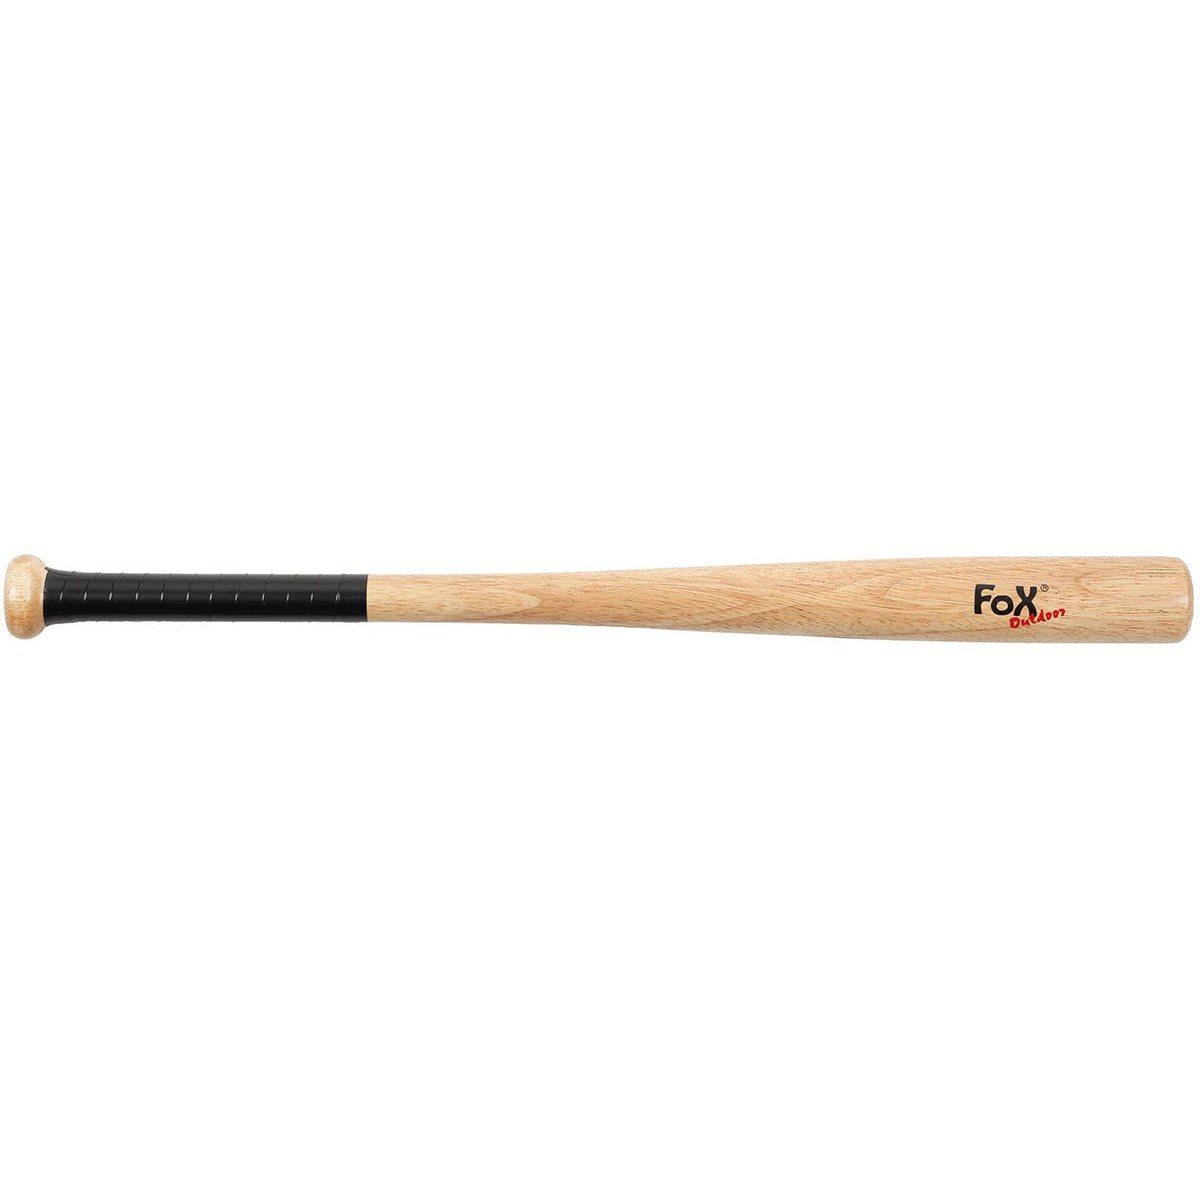 MFH int. comp. Pálka baseballová dřevo 66 cm NATUR